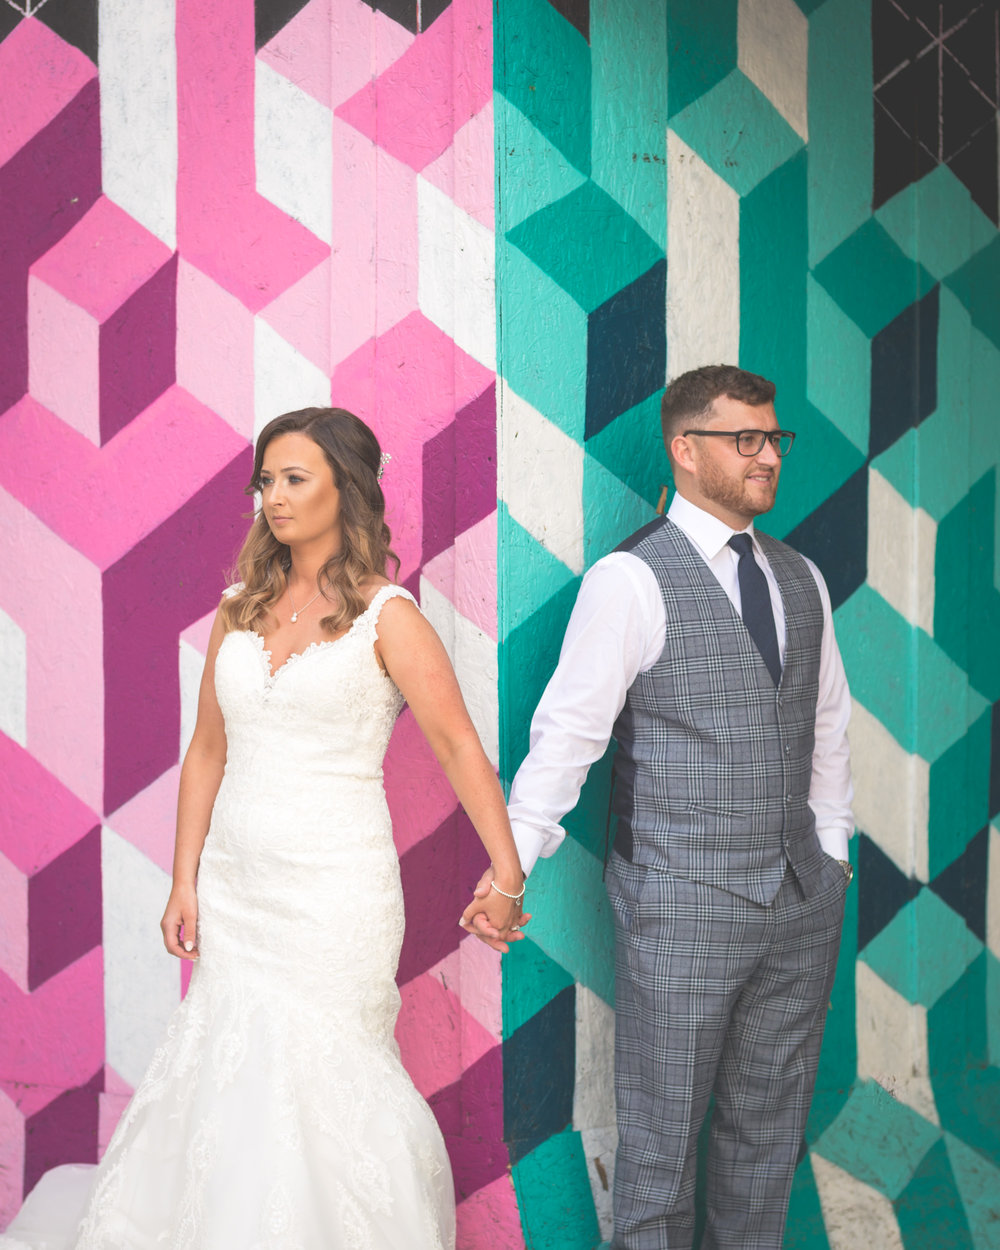 Brian McEwan | Northern Ireland Wedding Photographer | Rebecca & Michael | Portraits-98.jpg